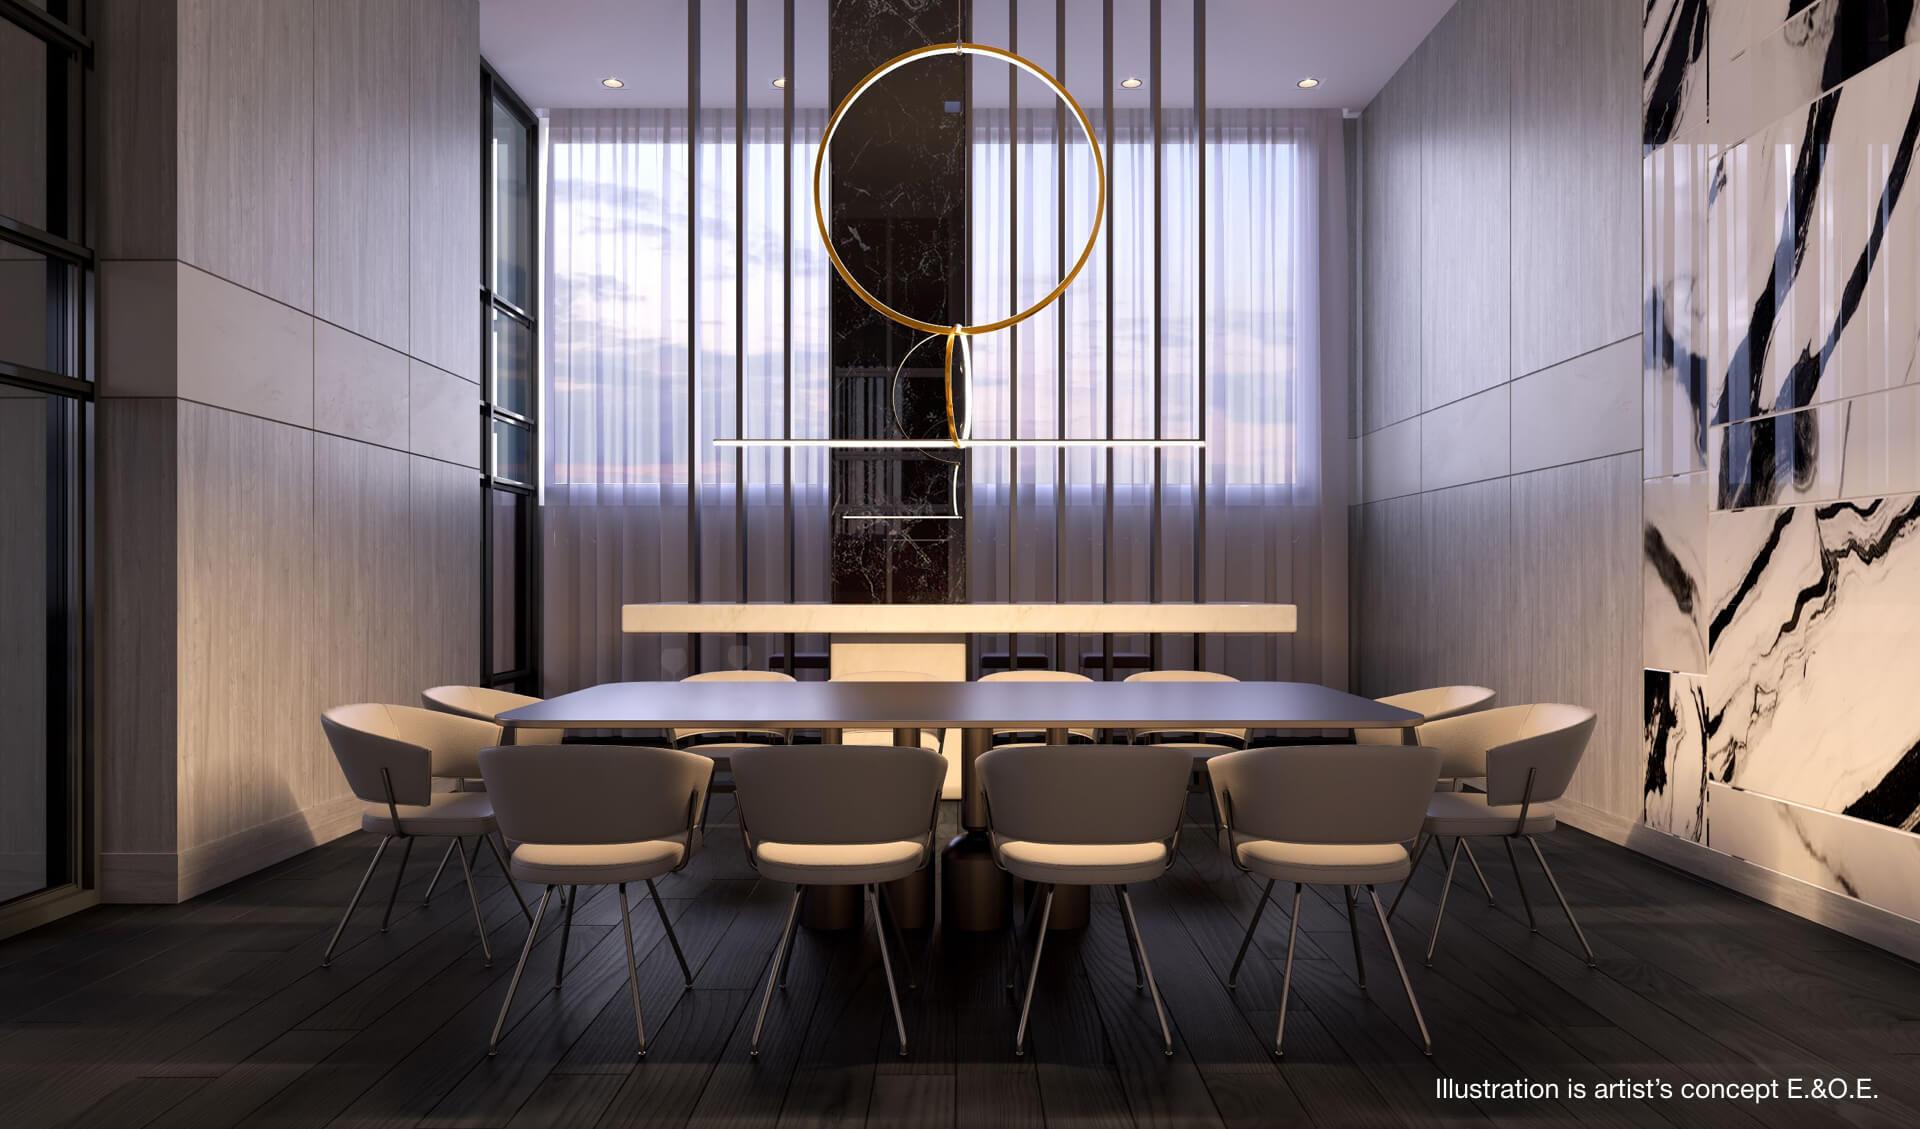 Universal City 3 Dining Room